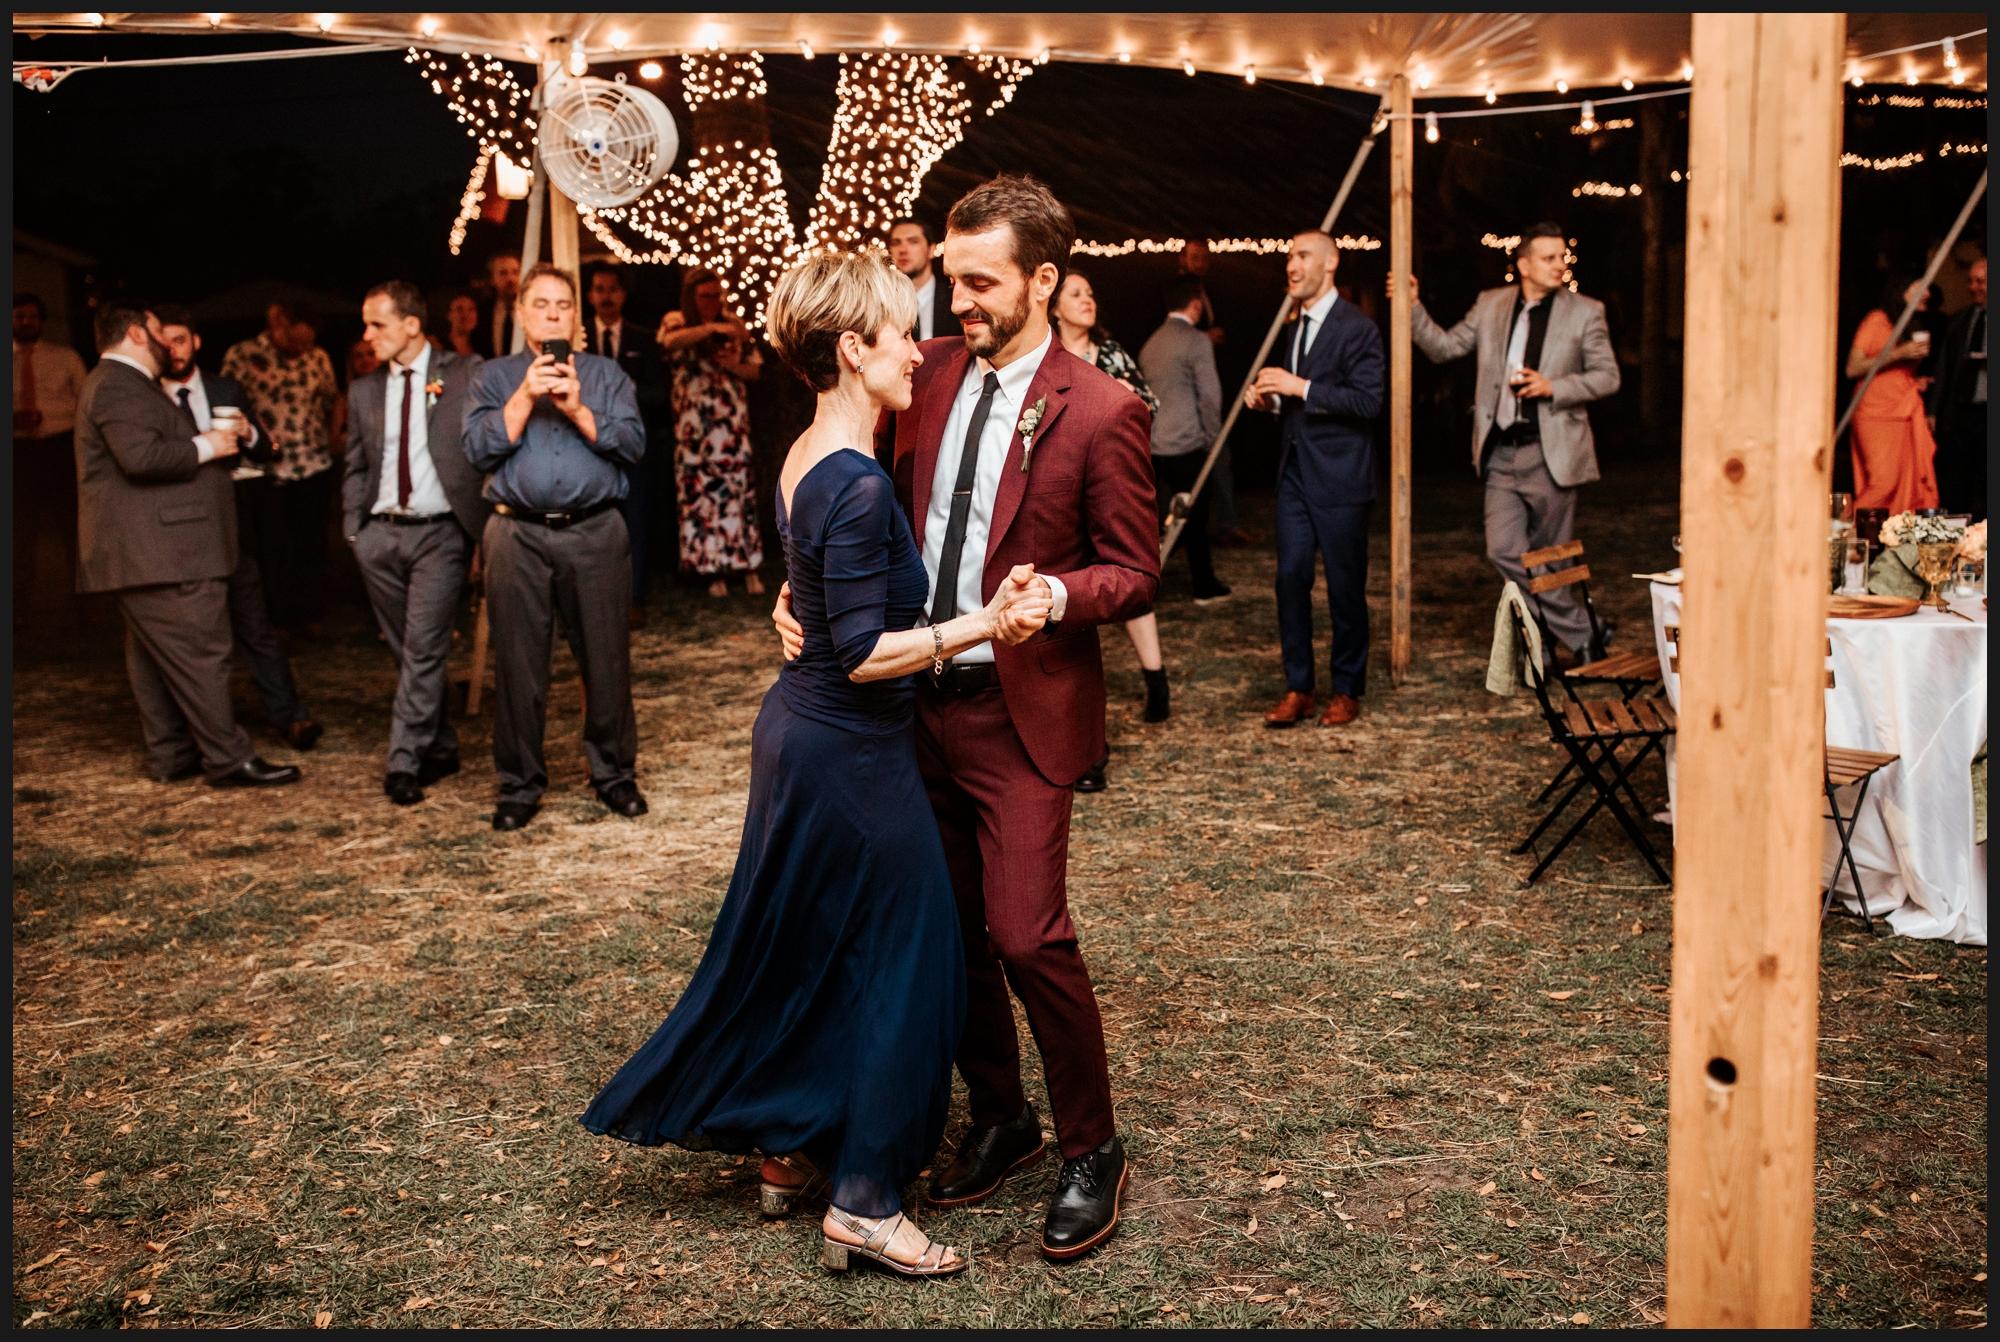 Orlando-Wedding-Photographer-destination-wedding-photographer-florida-wedding-photographer-bohemian-wedding-photographer_2048.jpg